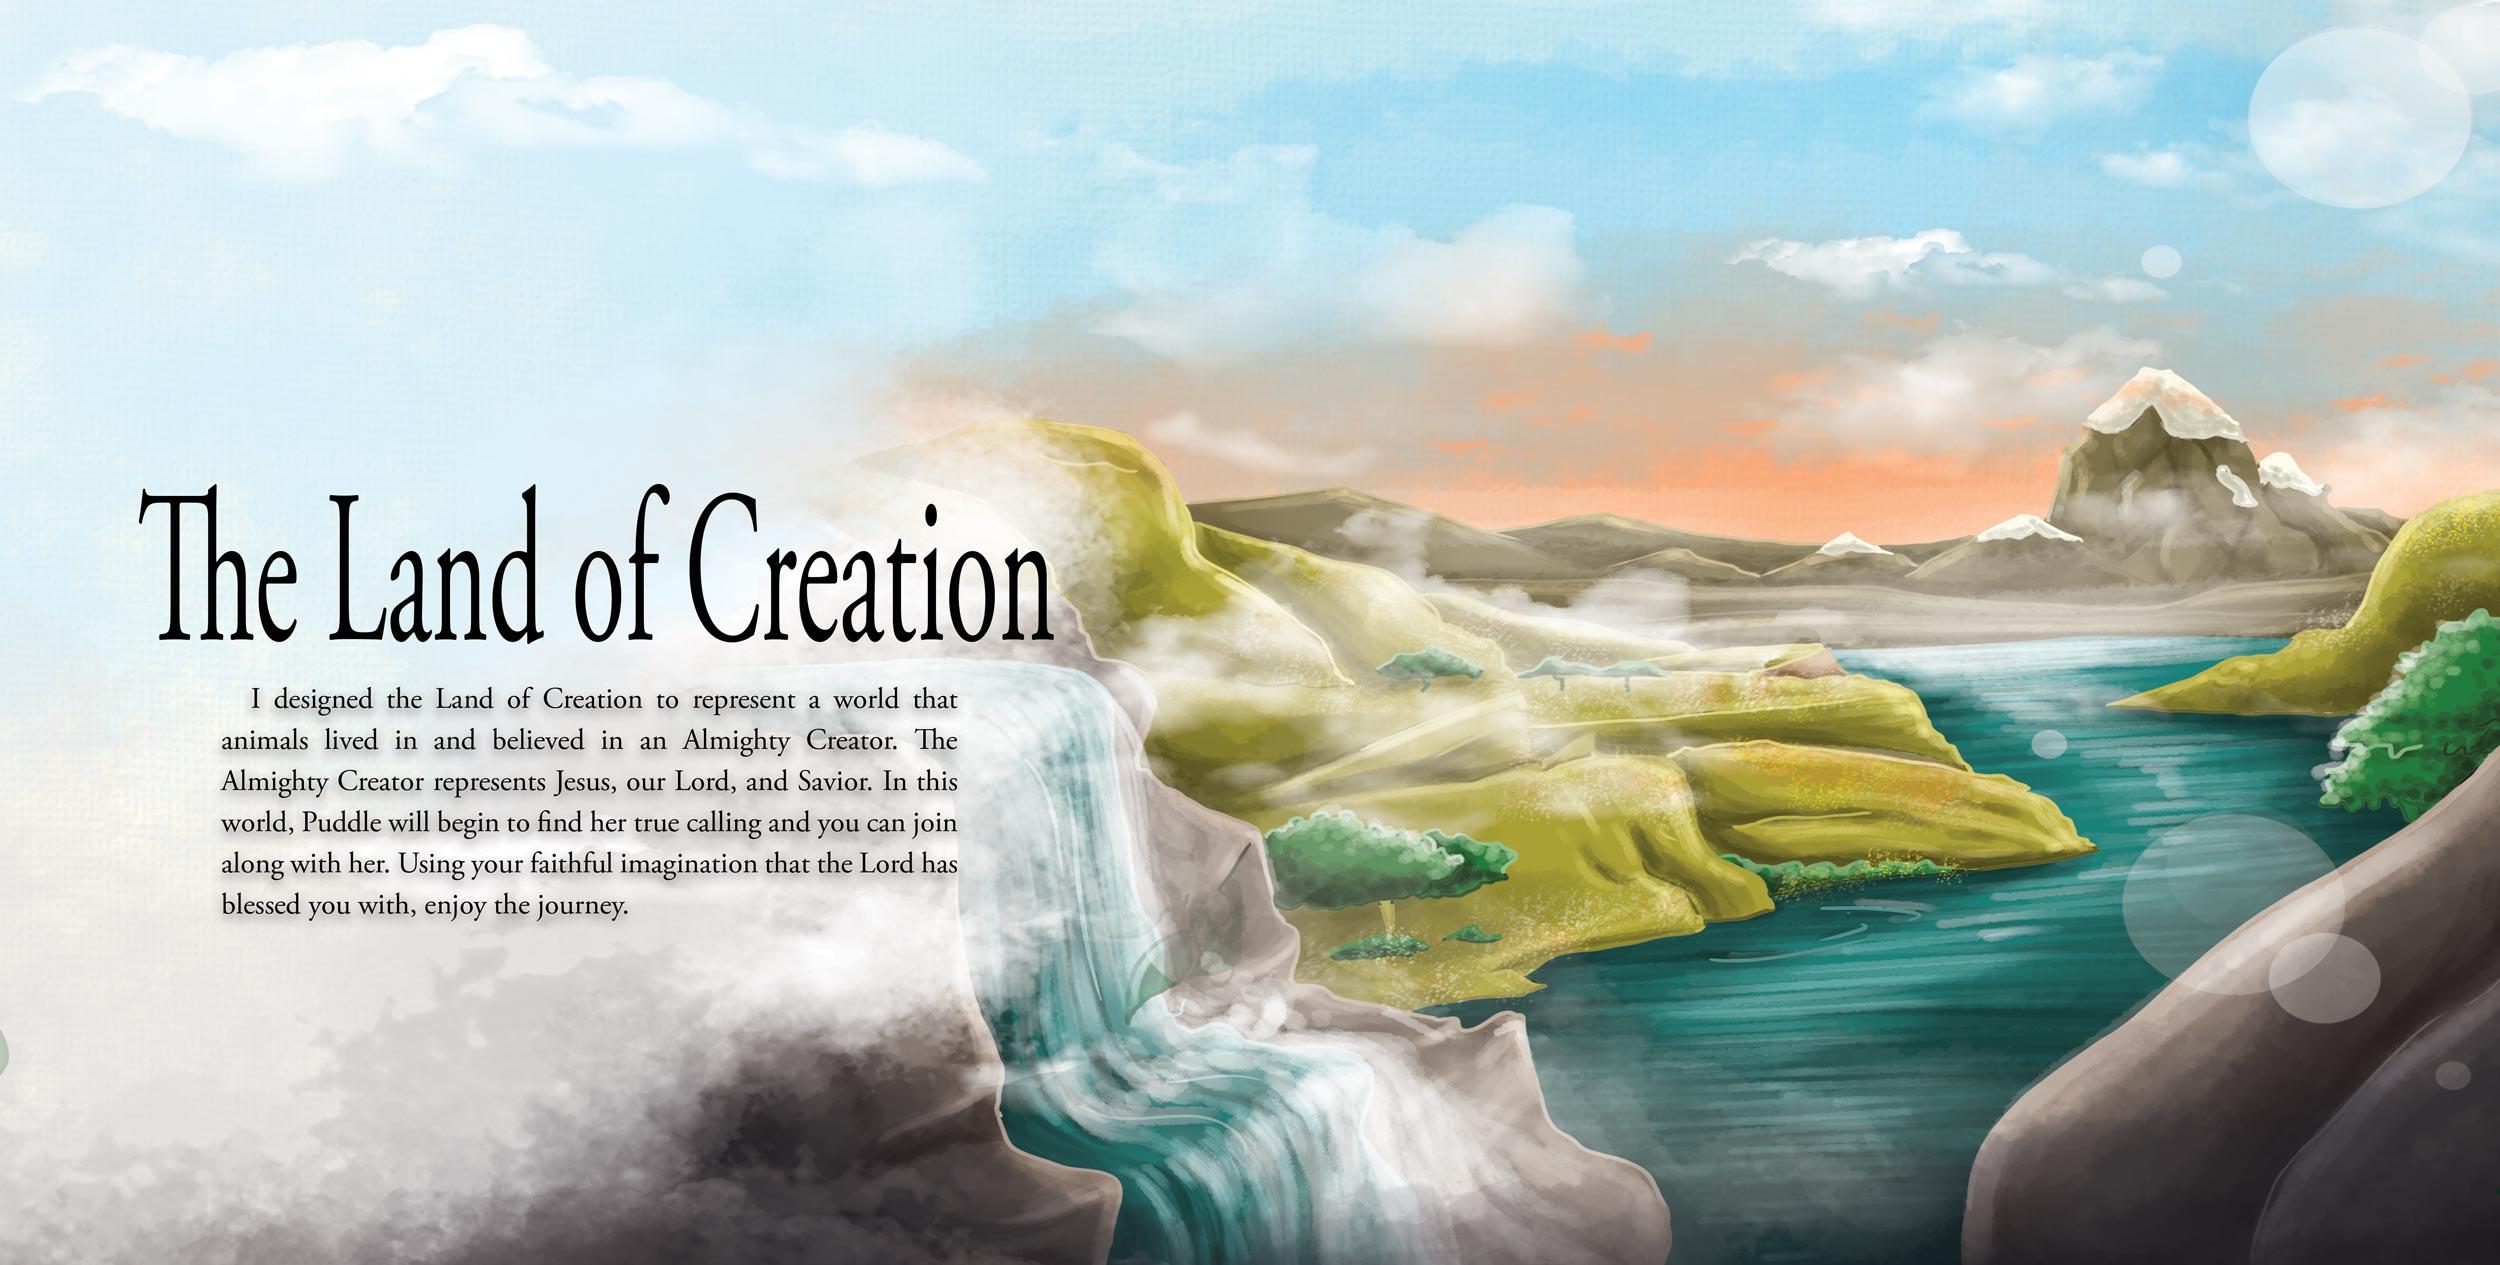 The-Land-of-Creation-19-20.jpg